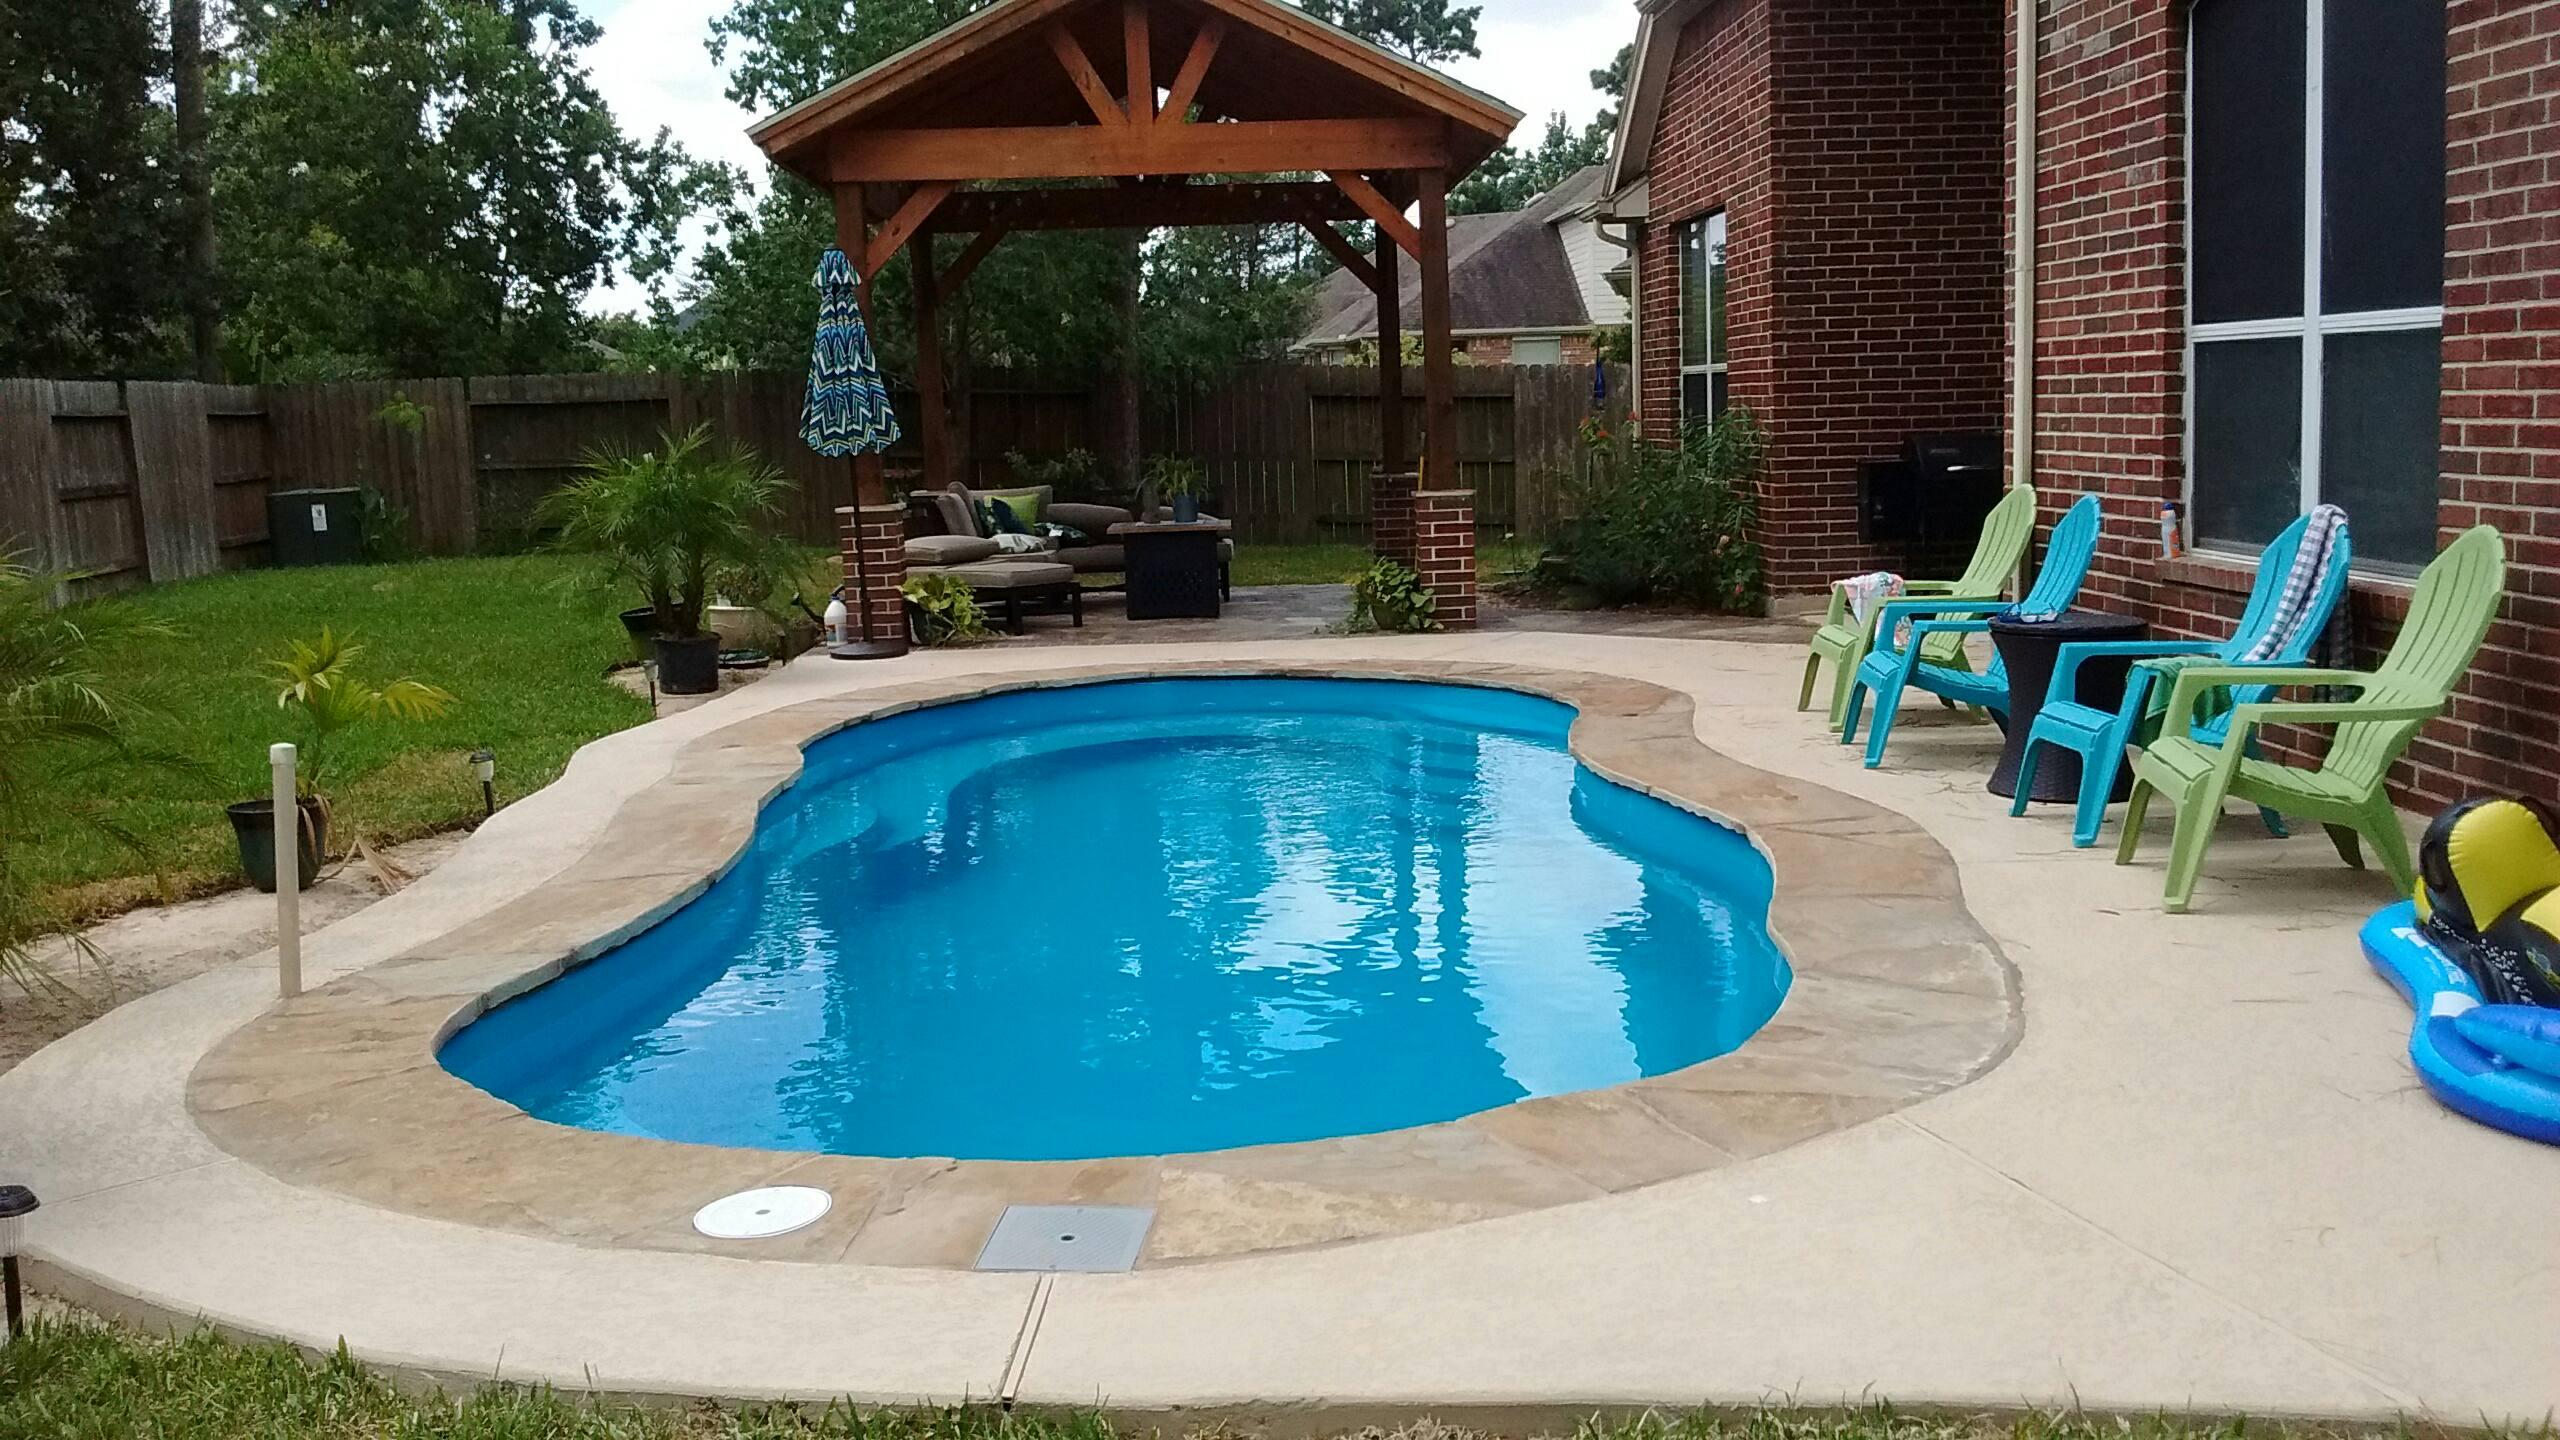 Leisure Pools Houston In Spring Tx 832 823 4